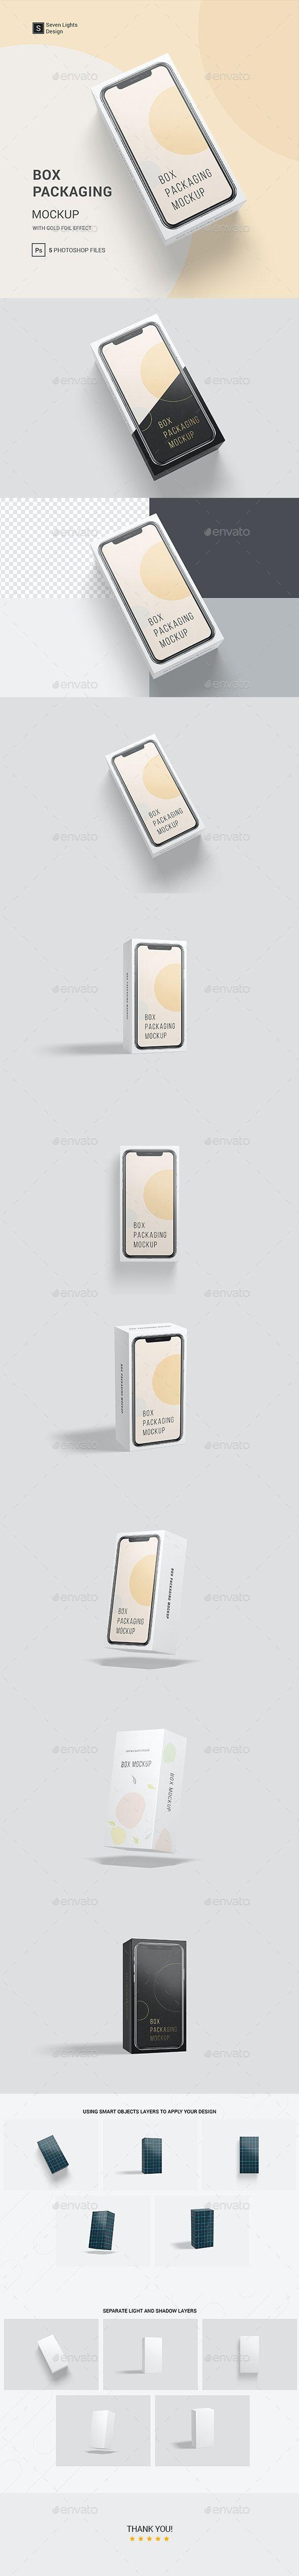 Download Box Packaging Mockup In 2020 Packaging Mockup Mockup Mockup Design